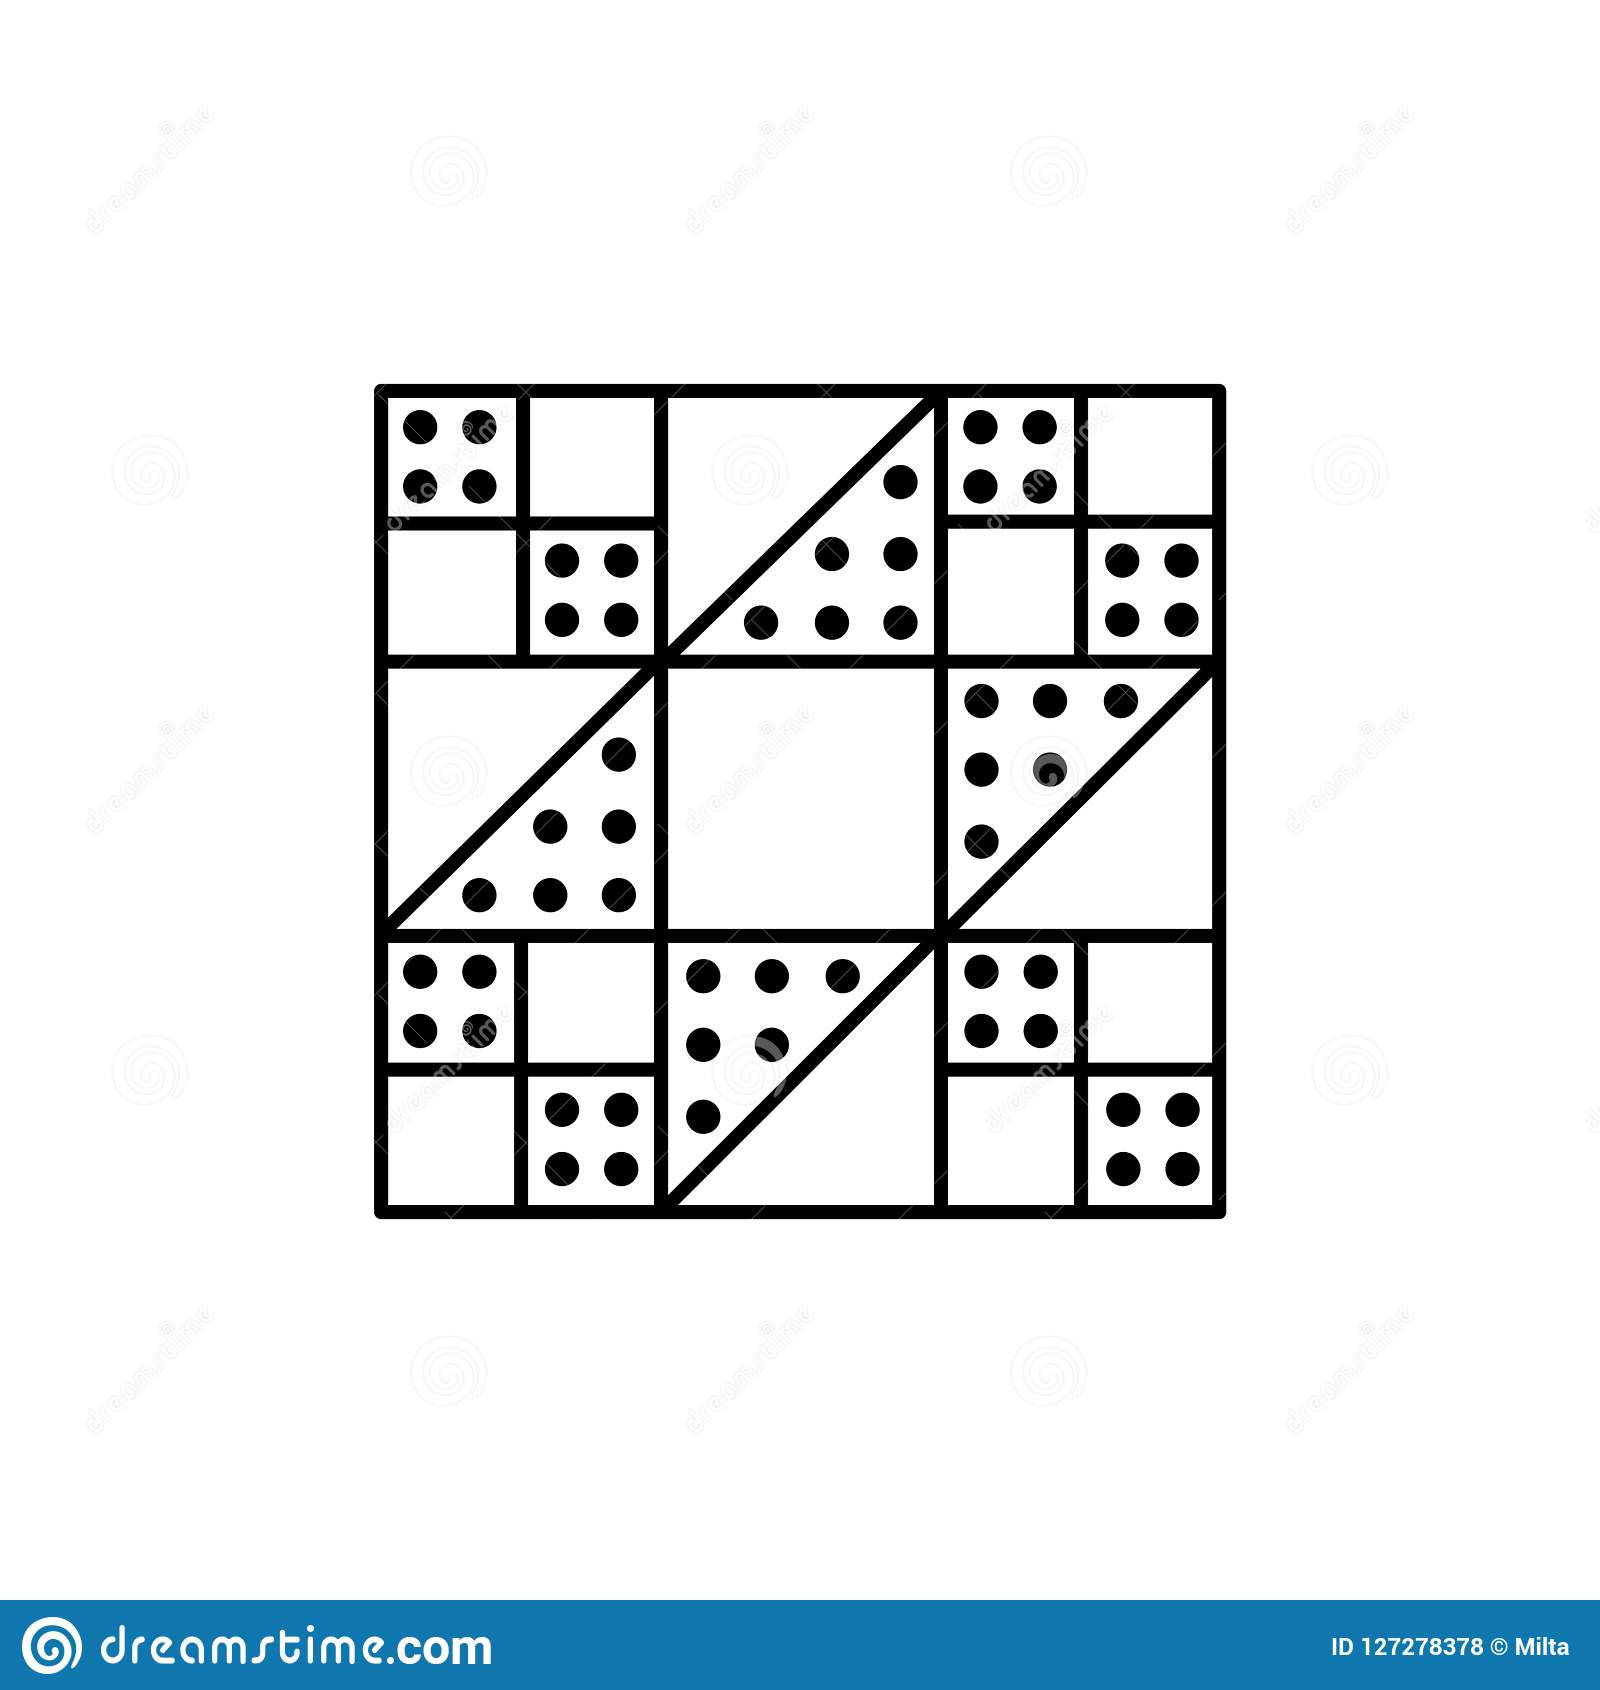 Black White Vector Illustration Of Stepping Stones Quilt Pattern